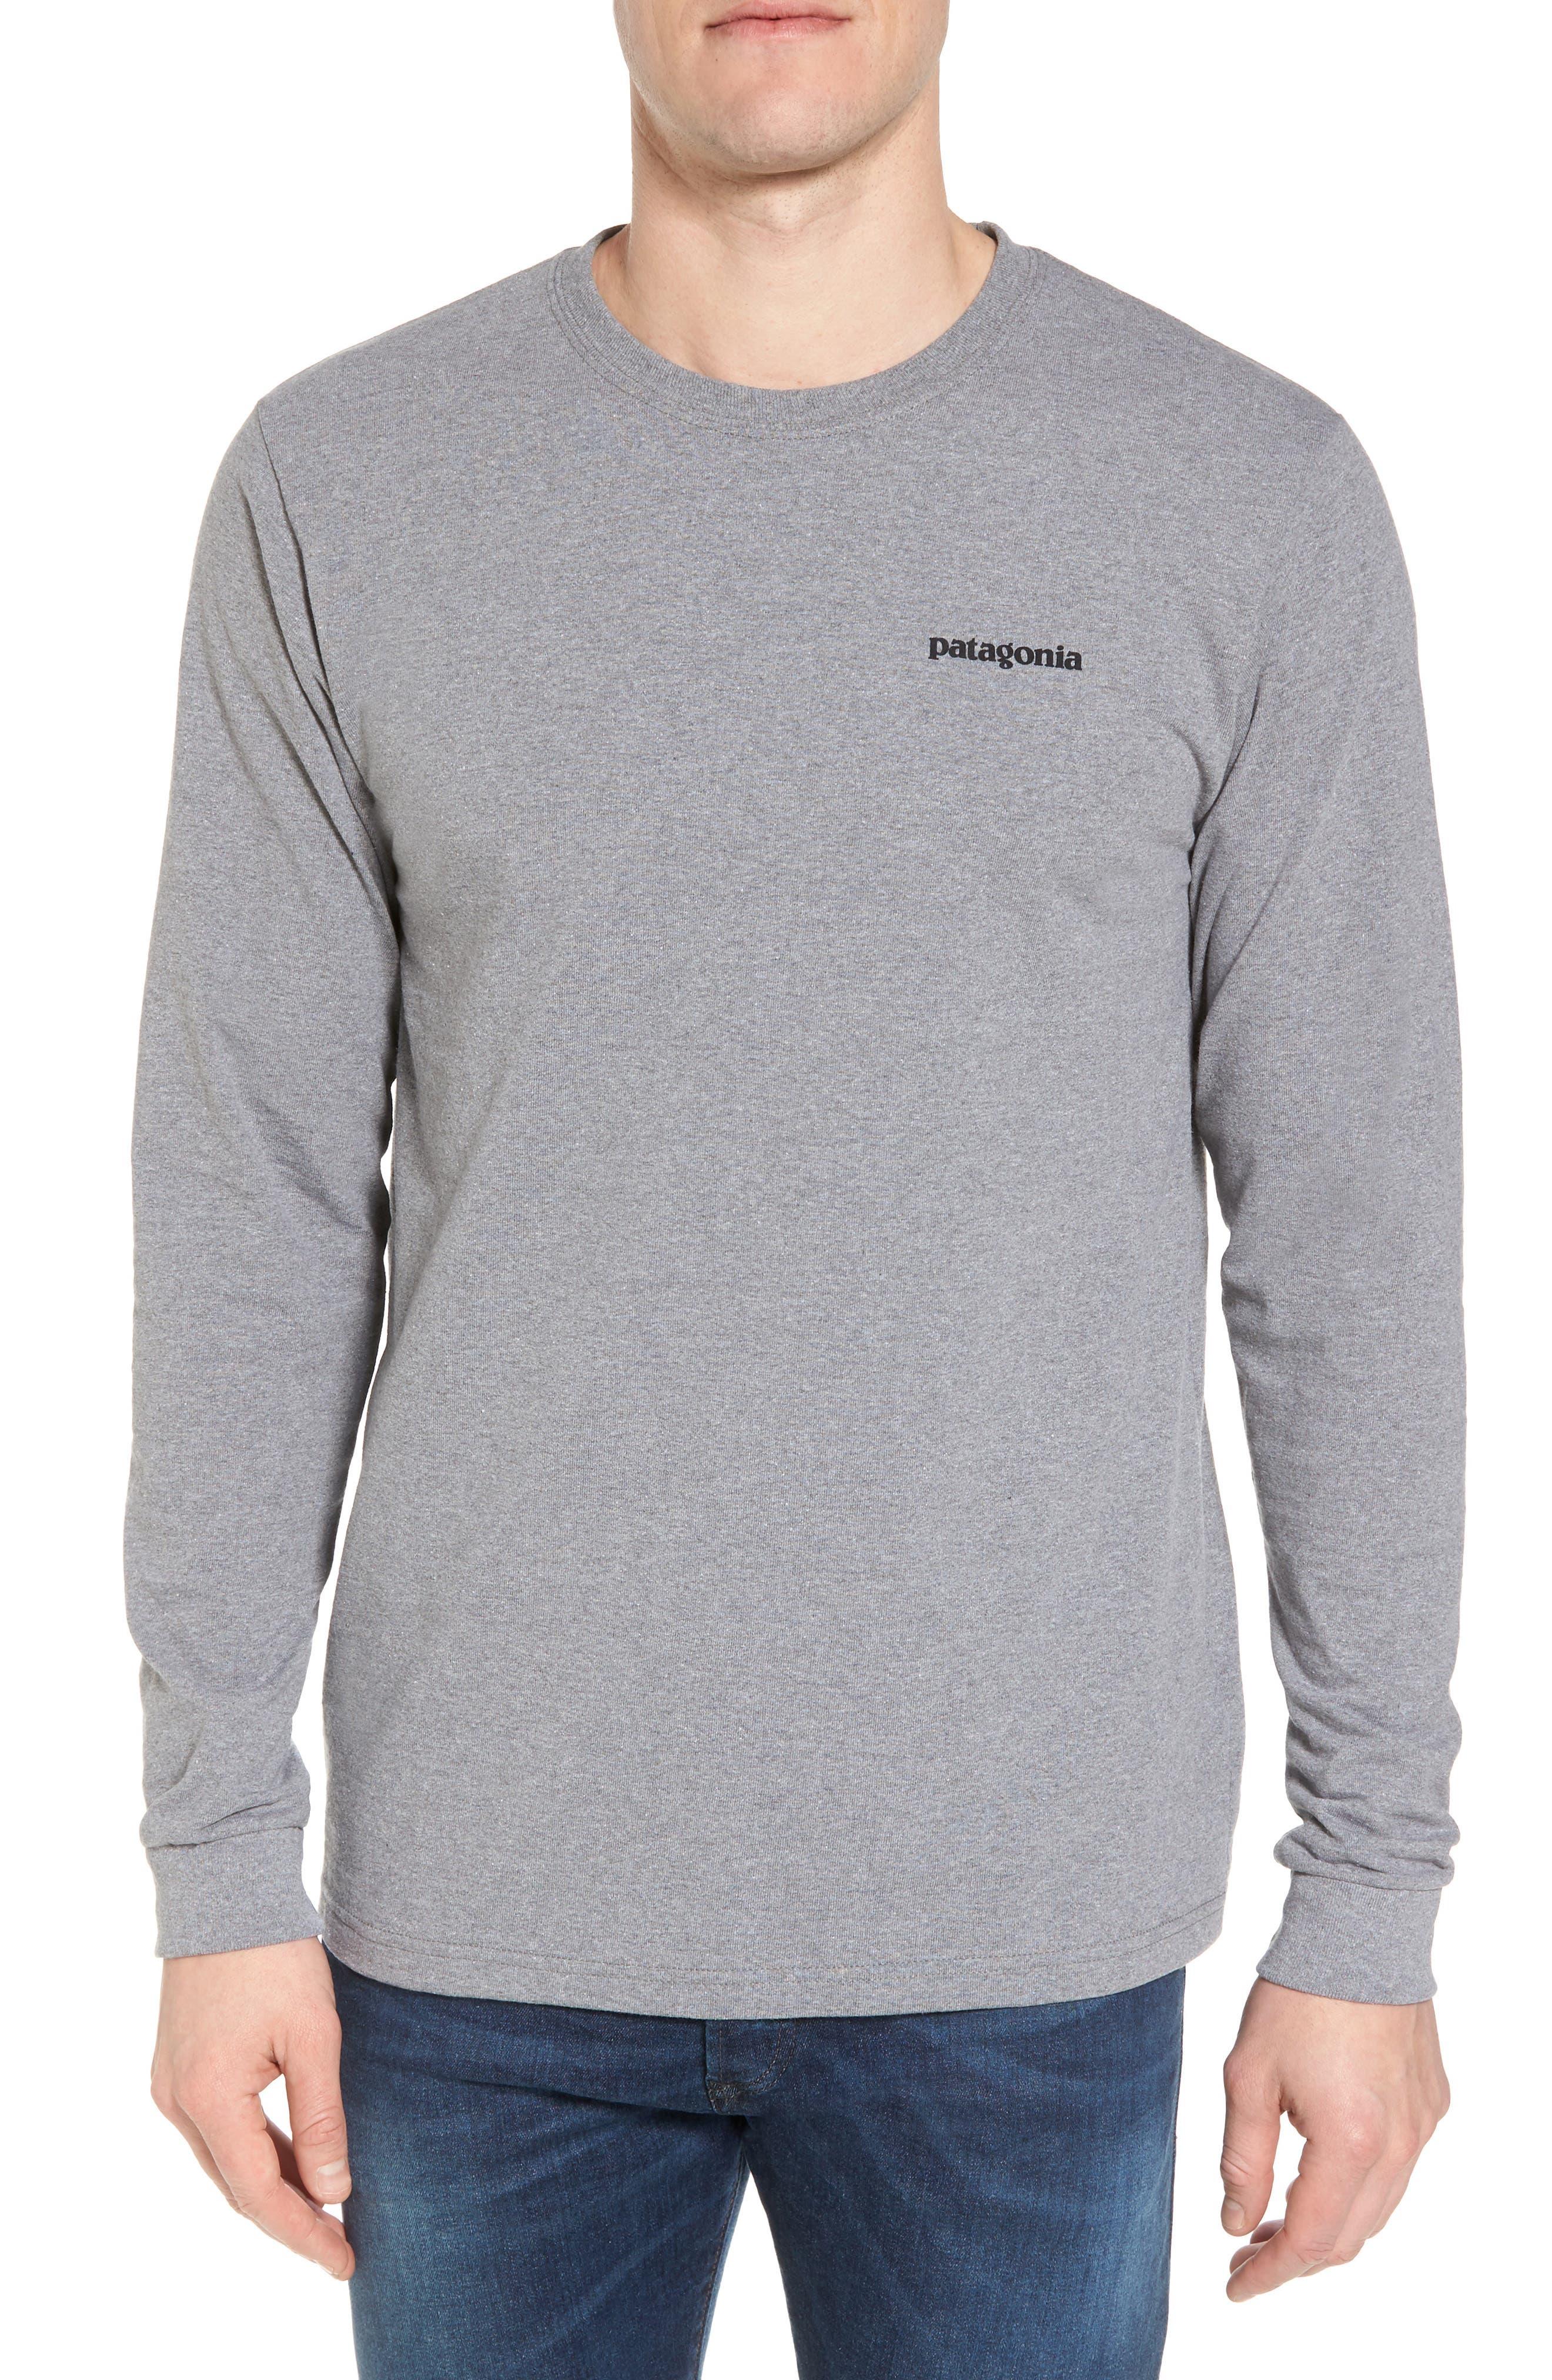 Patagonia Responsibili-Tee Long Sleeve T-Shirt, Grey